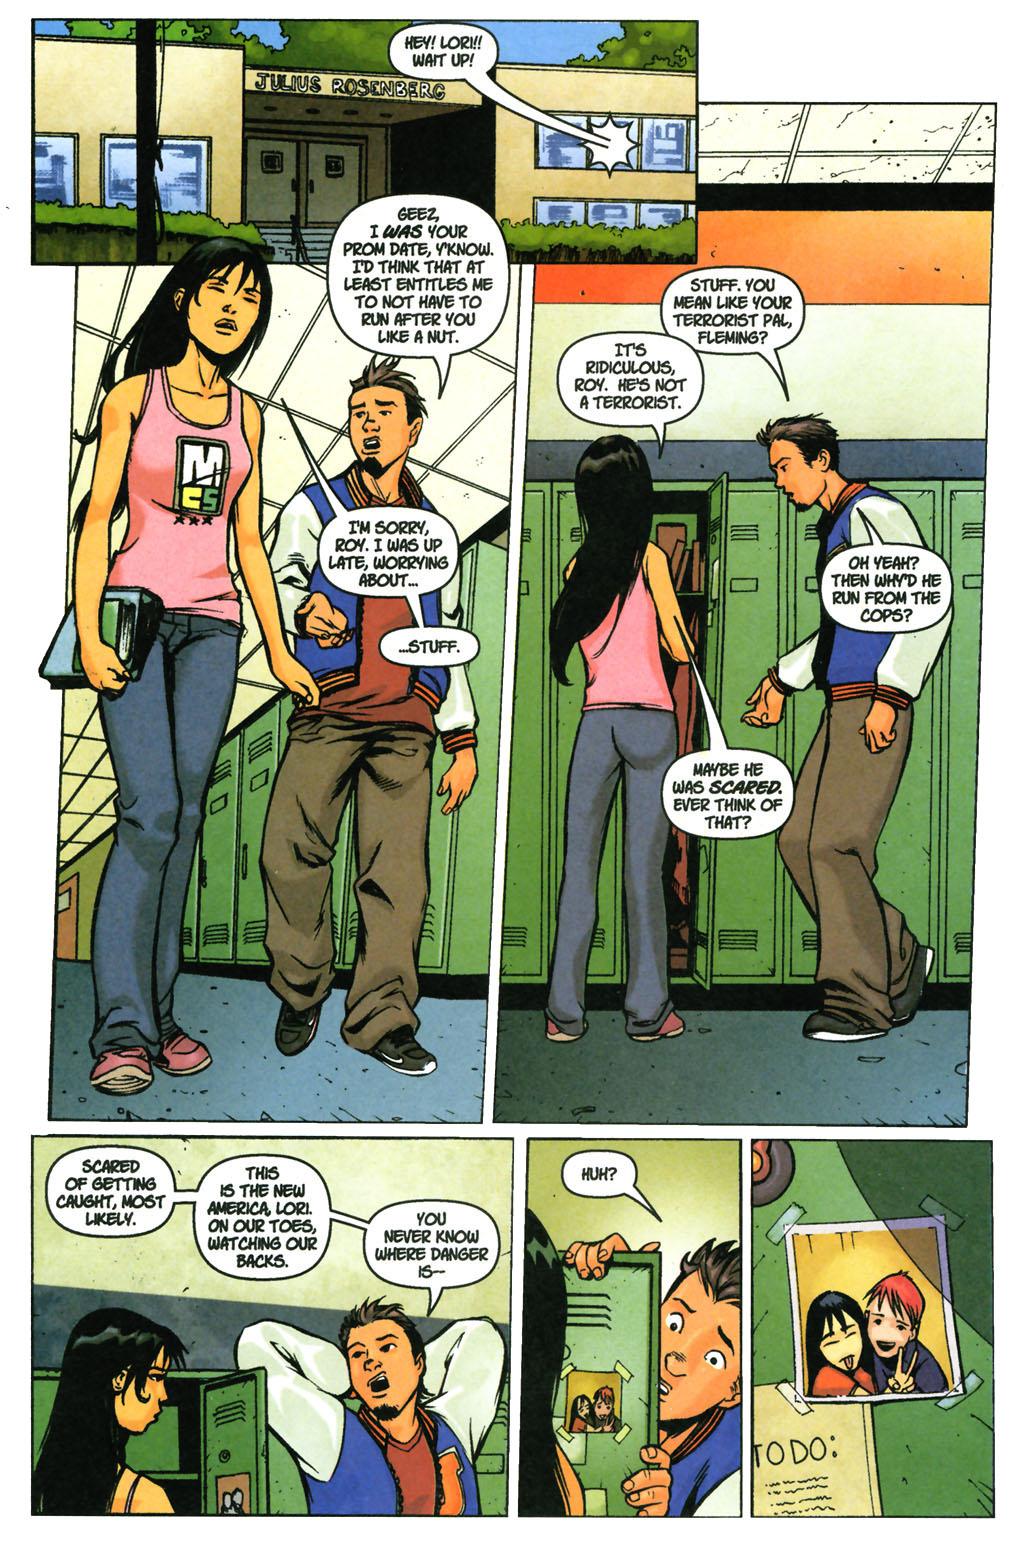 Read online SpyBoy: Final Exam comic -  Issue #3 - 18